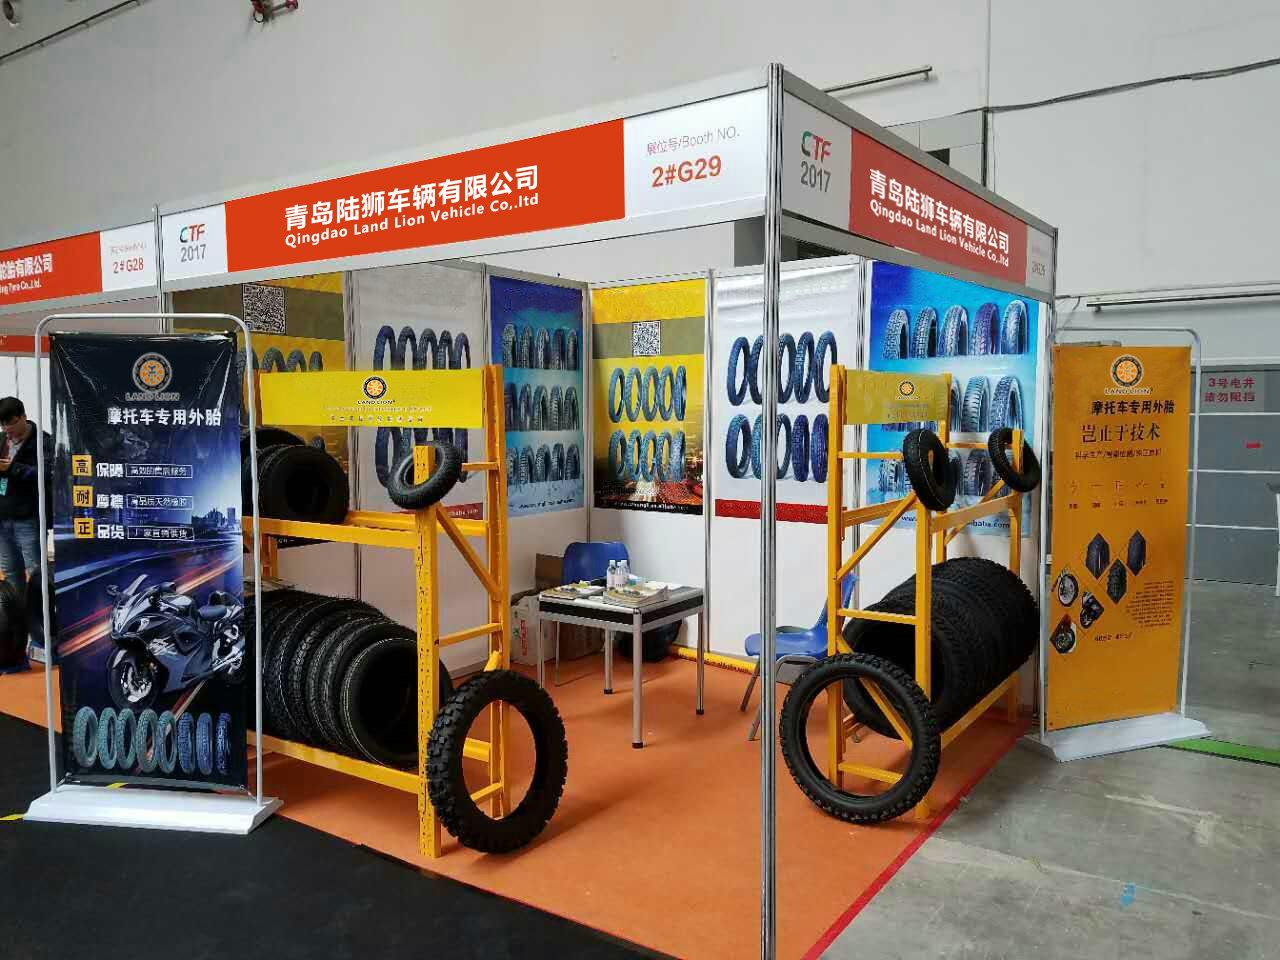 Motorcycle parts fair show